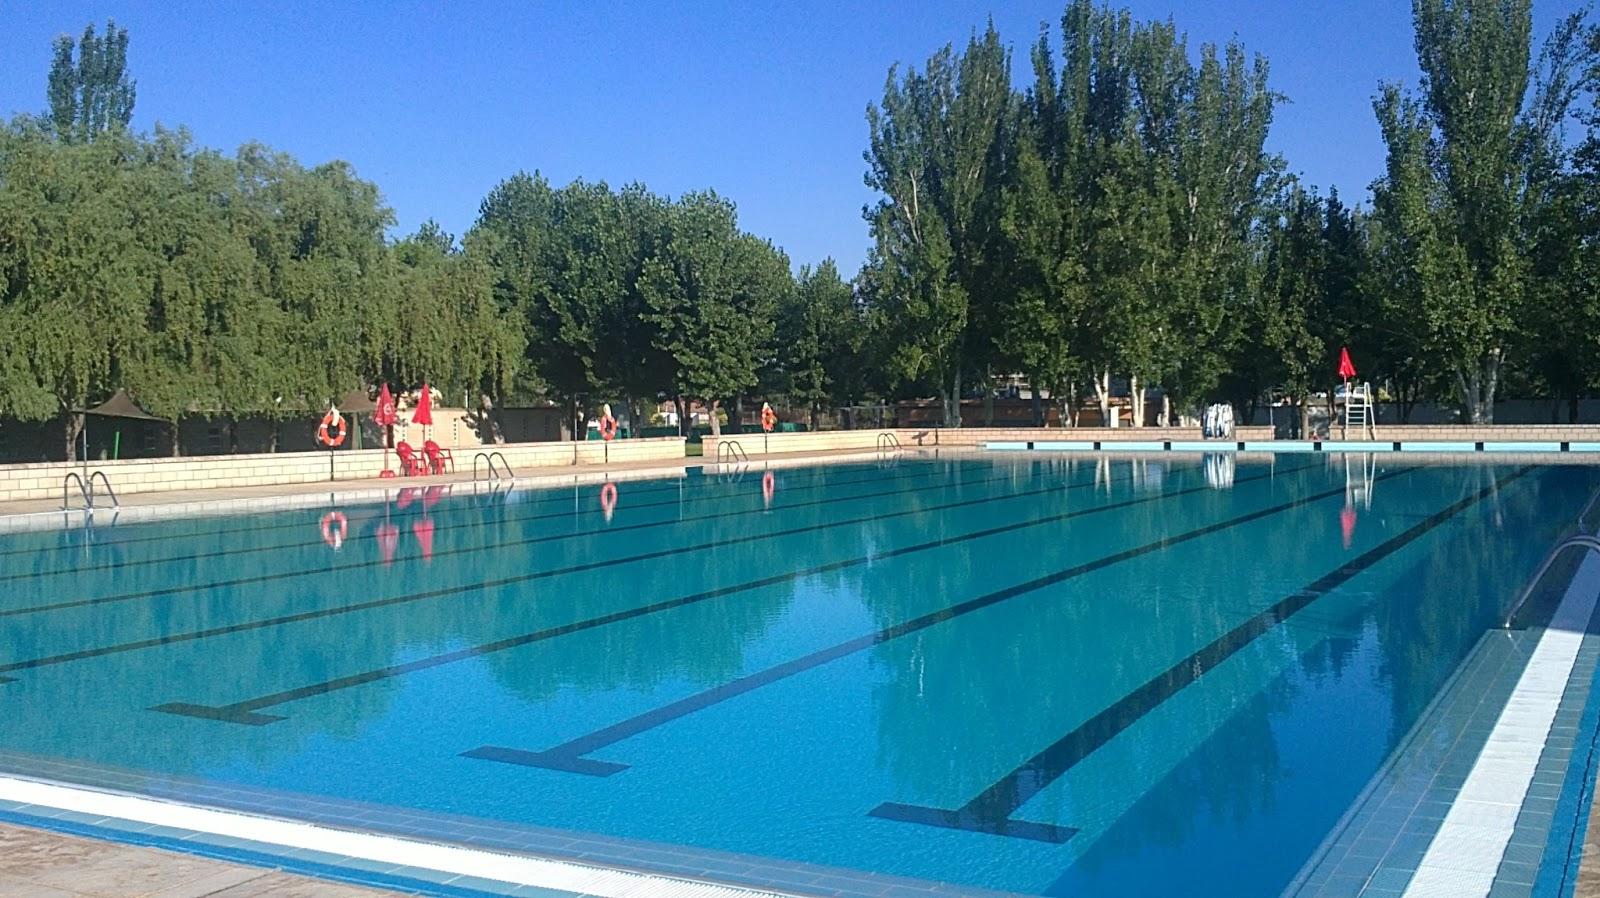 Zafra ciudad deportiva piscina municipal de verano for Piscina municipal ciudad real